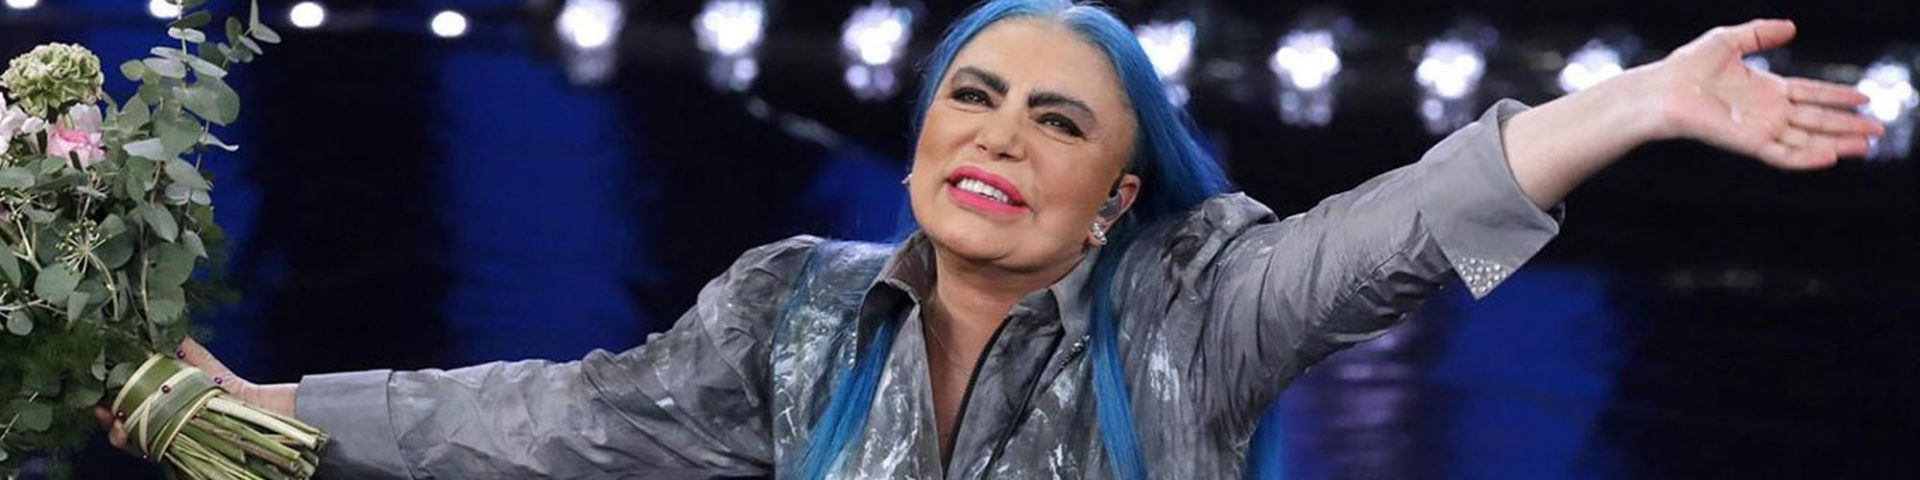 "Loredana Bertè esclusa dal concerto ""Una. Nessuna. Centomila""? Lo sfogo"